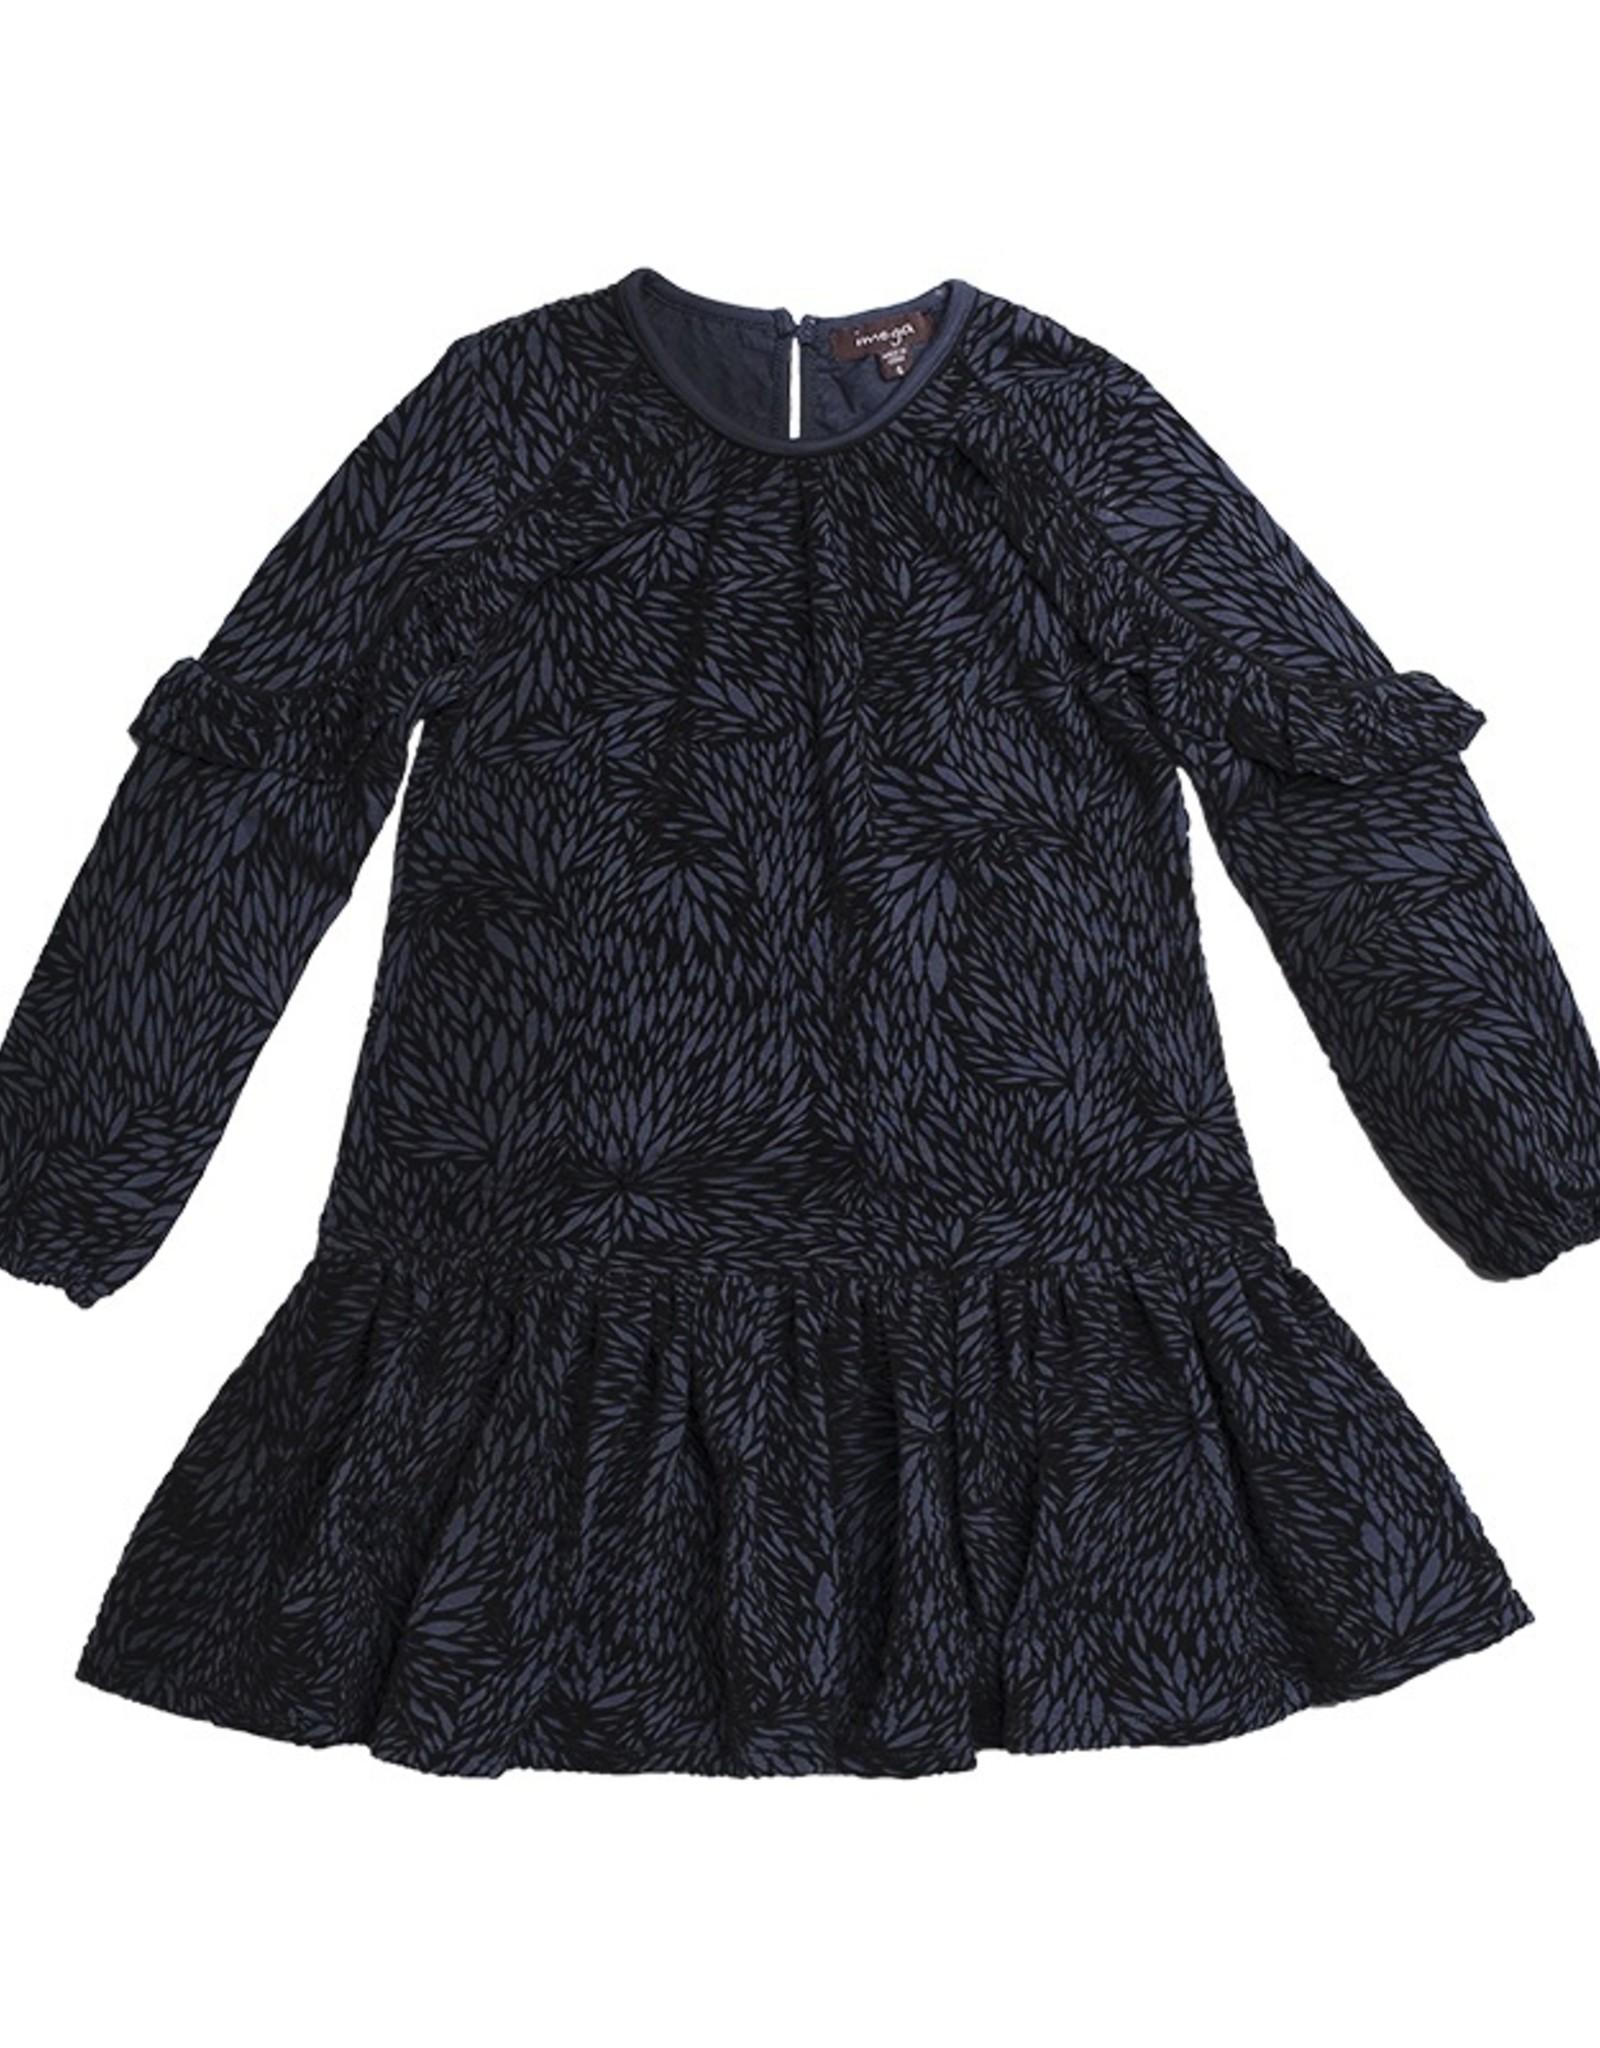 Girls Flocked Black Grey Leaves Print Dress